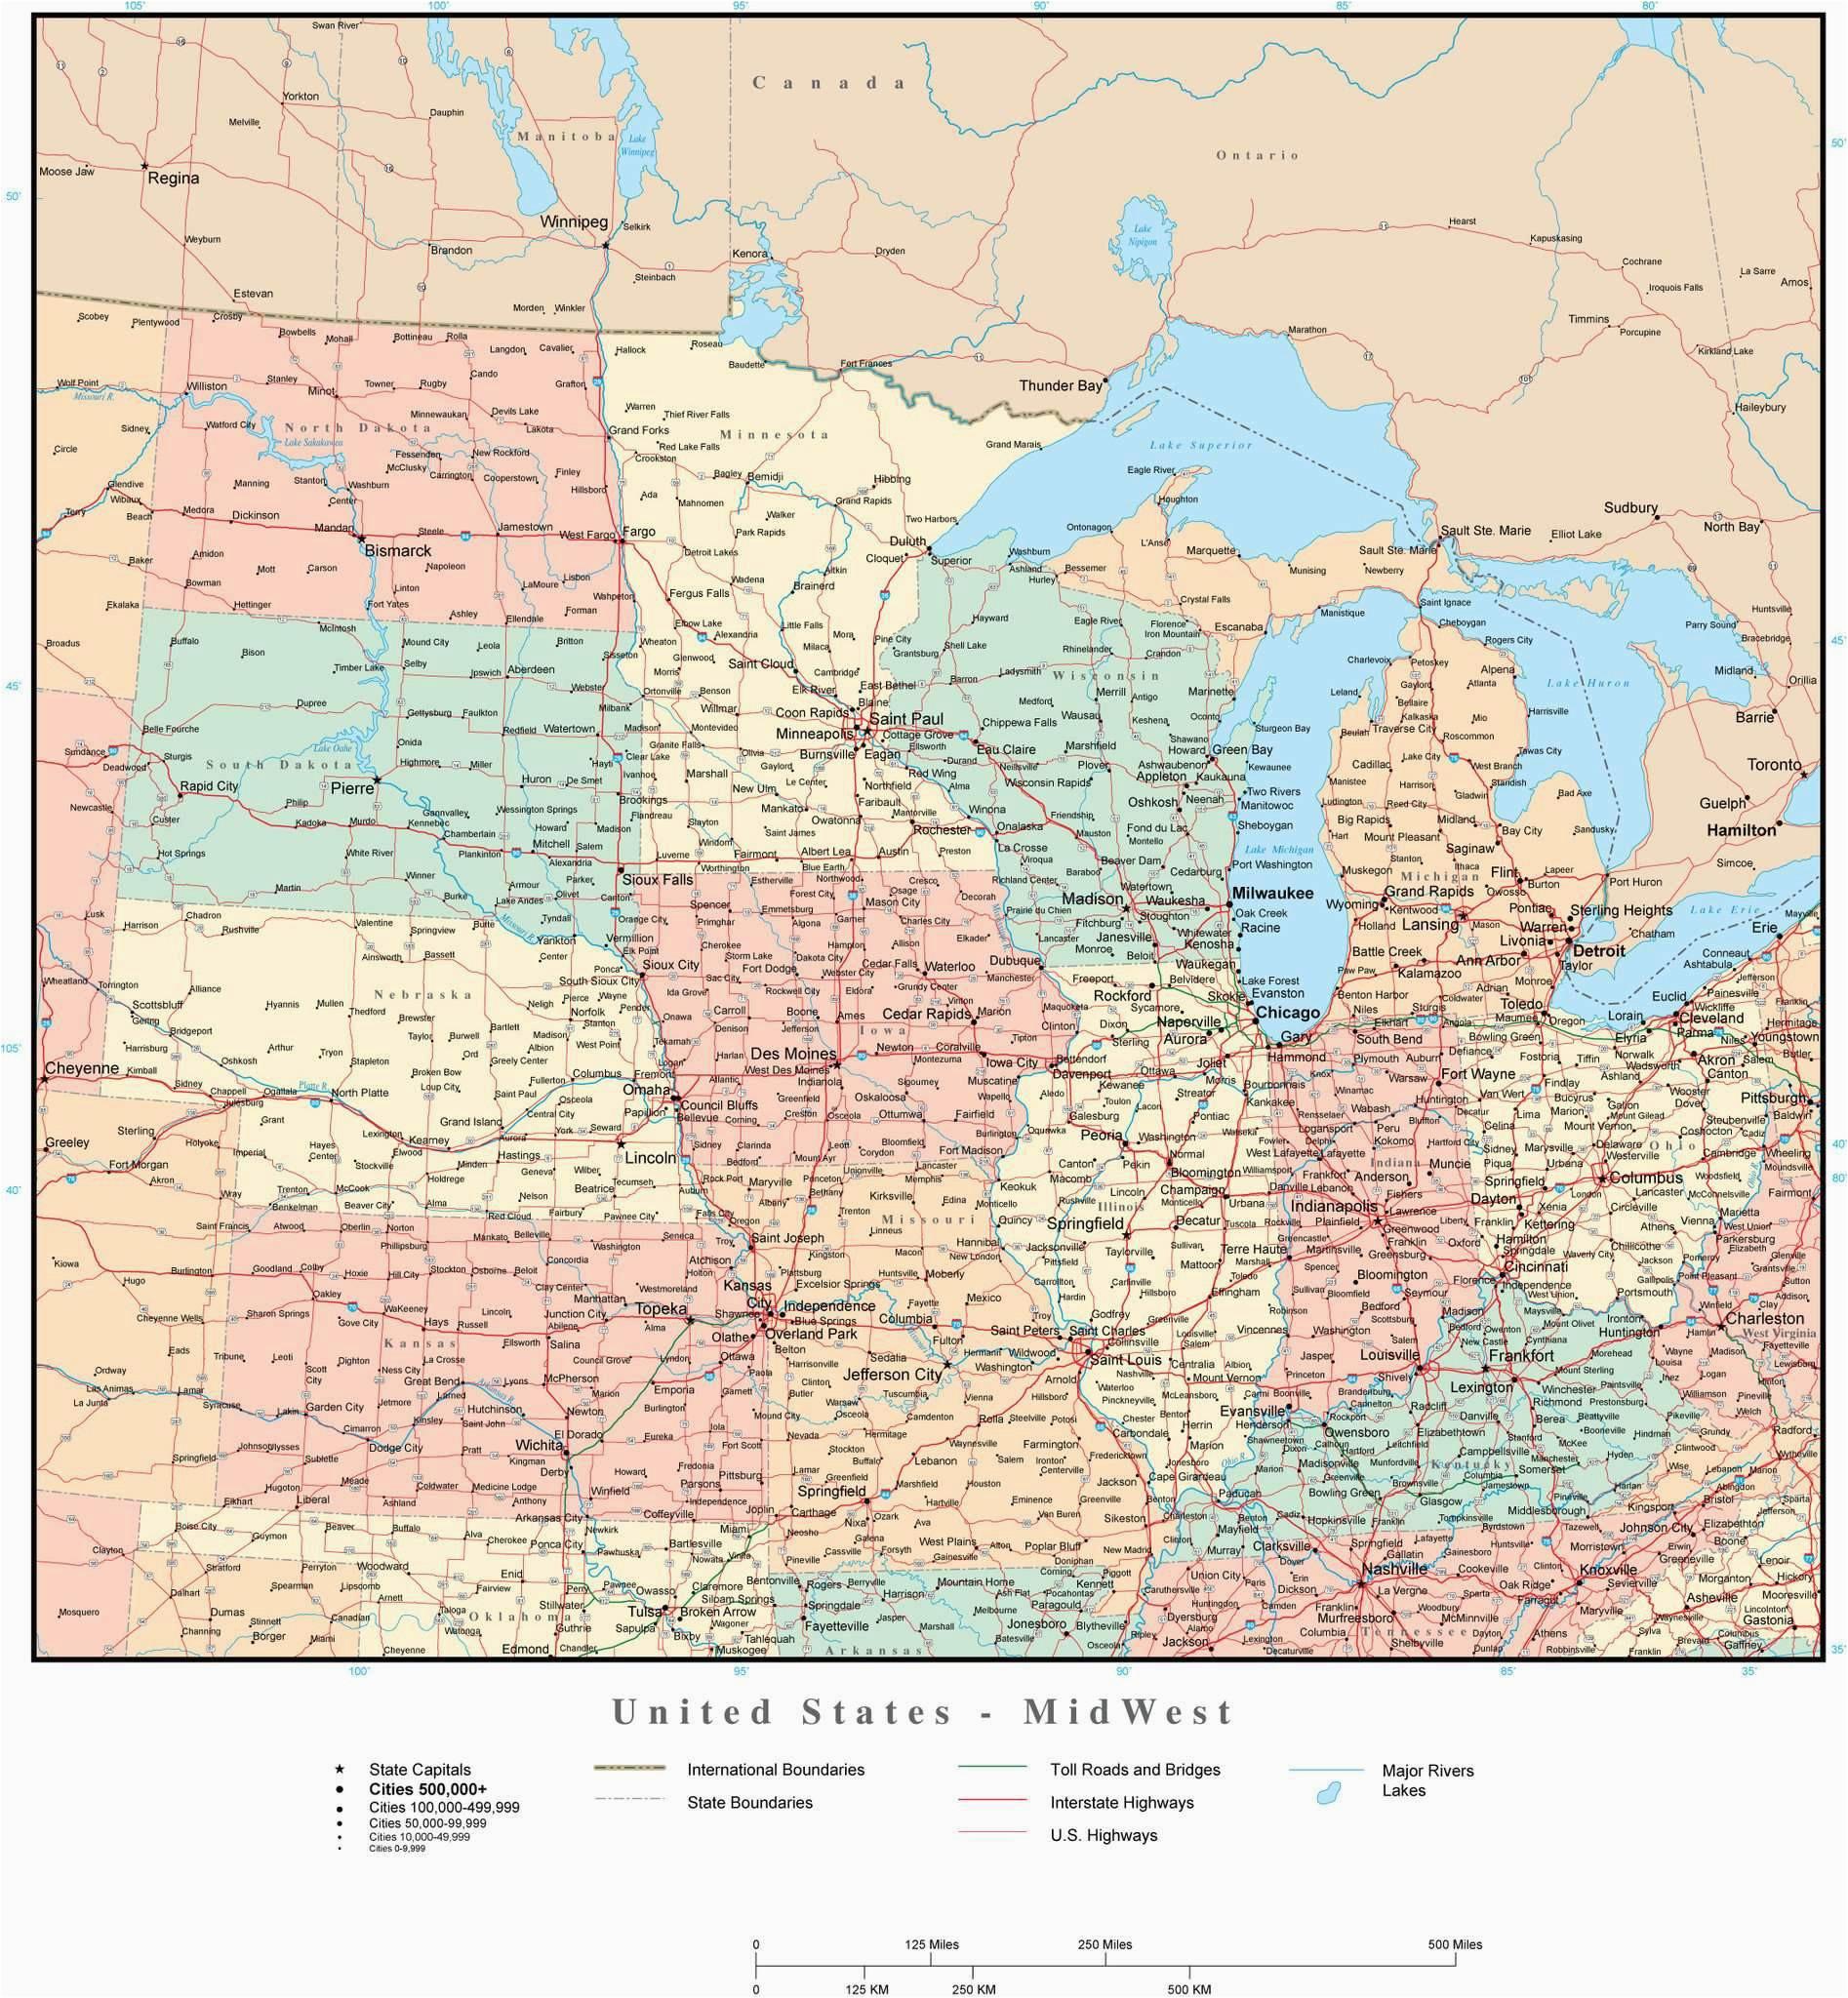 Minnesota Road Conditions Map Iowa Minnesota Road Conditions Map Usa Midwest Region Map with